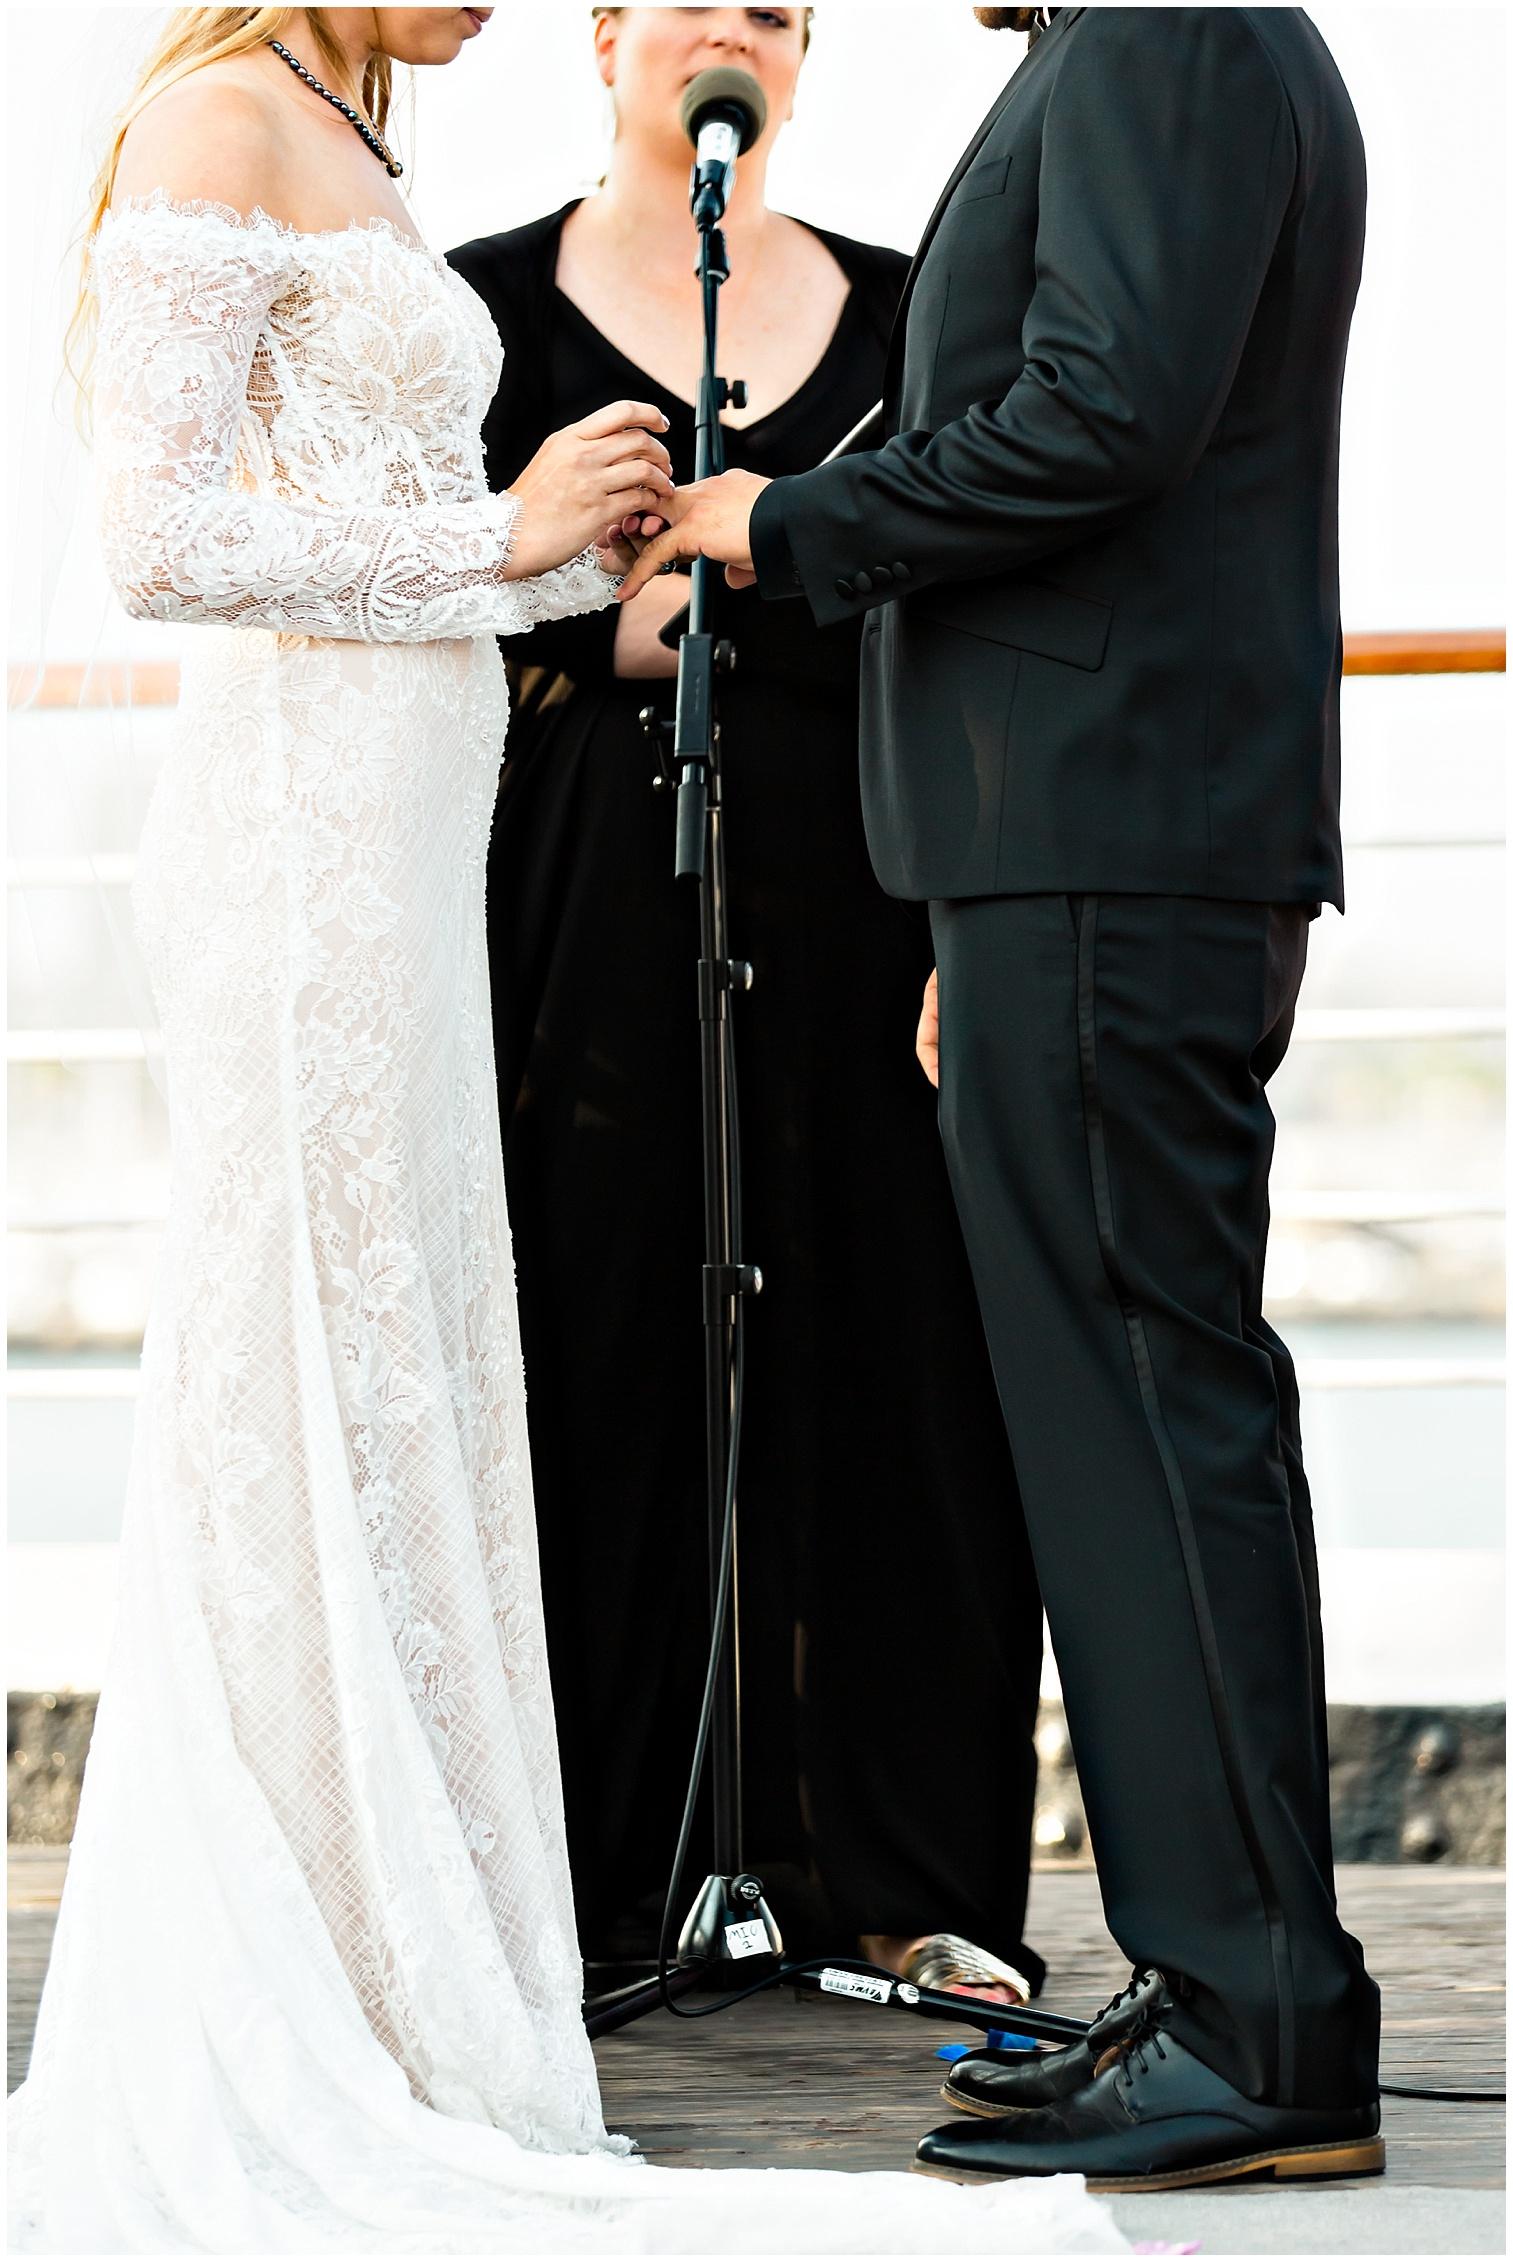 Queen_Mary_Long_Beach_Wedding_Photography_0474.jpg